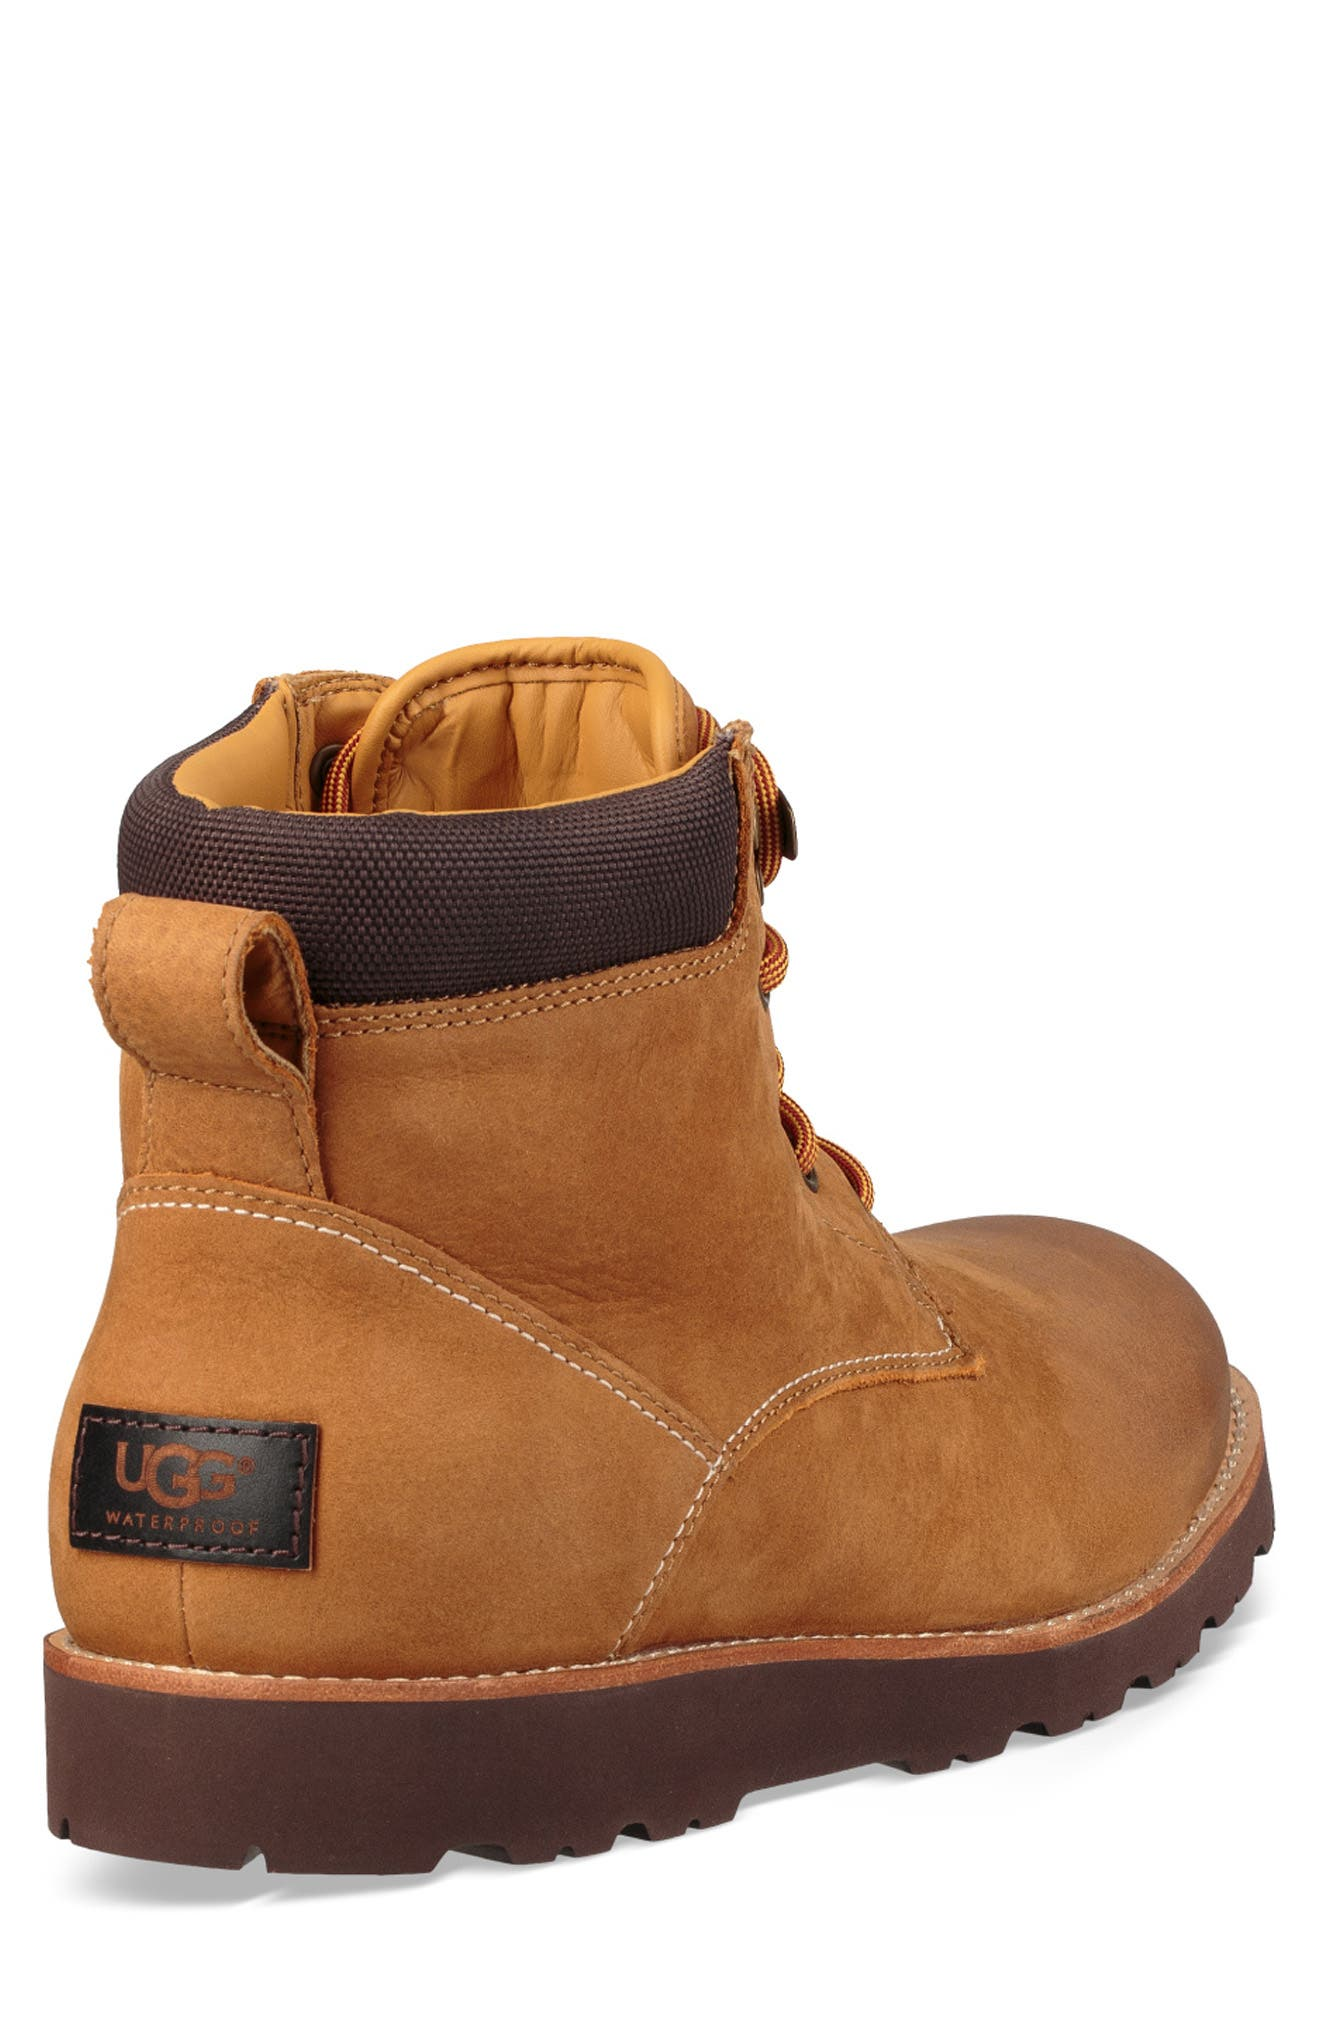 Seton Waterproof Chukka Boot,                             Alternate thumbnail 2, color,                             WHEAT